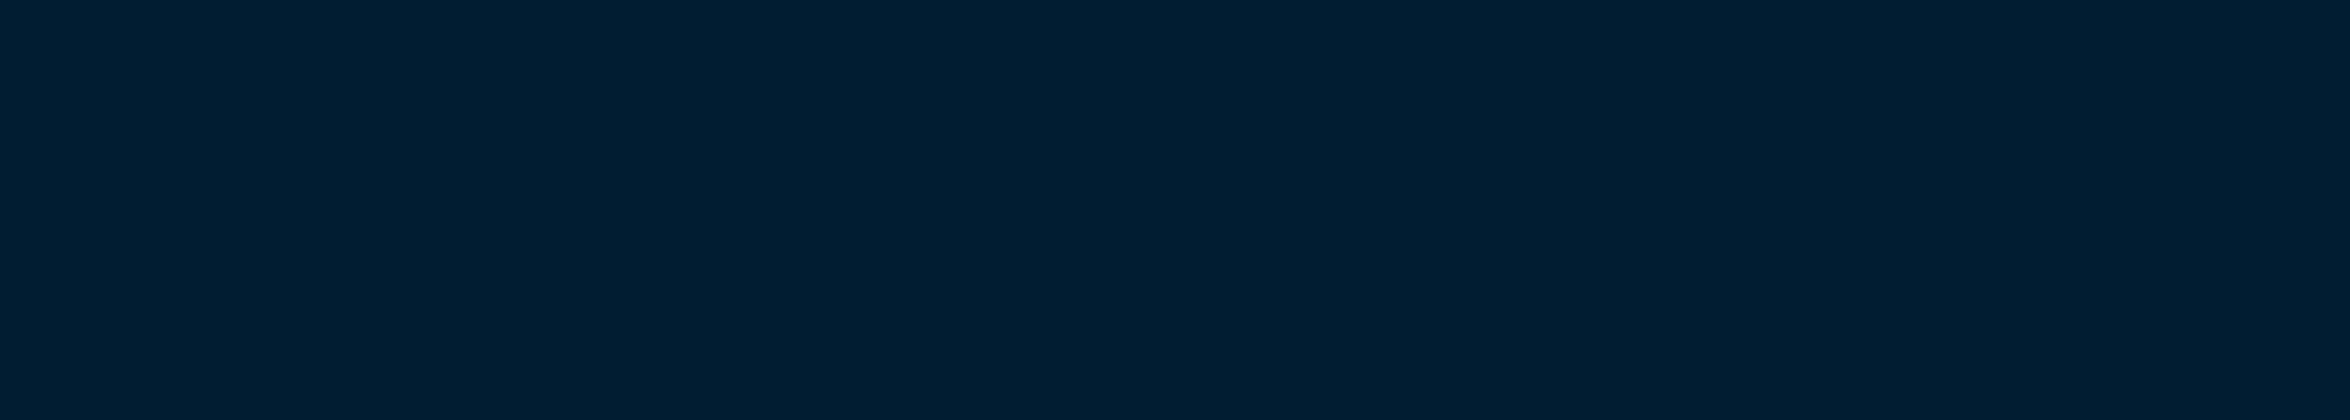 https://gewerksmeister.com/wordpress/wp-content/uploads/2019/05/blue_gradient.png